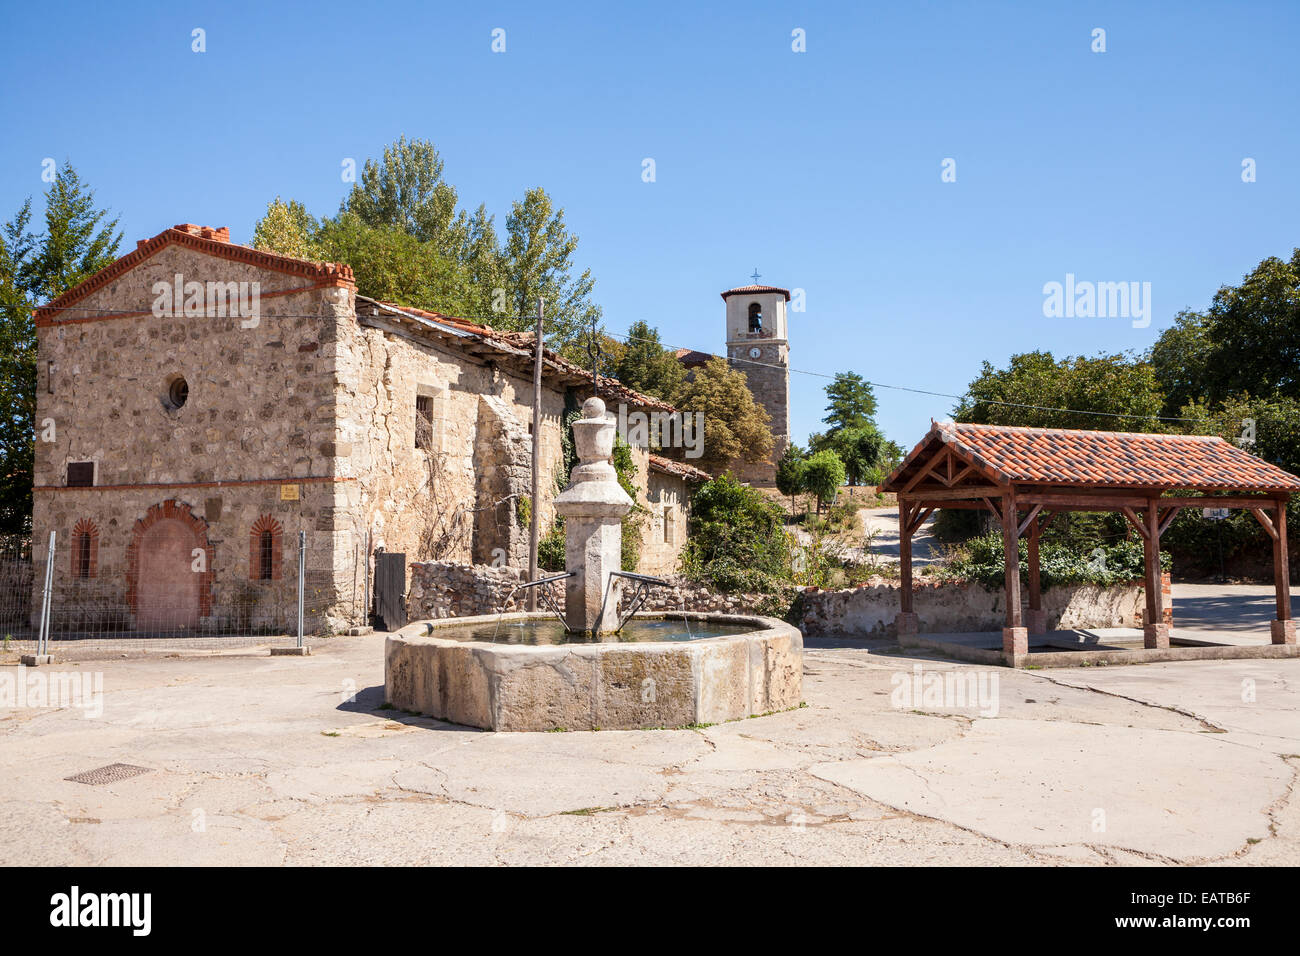 Hermitage of San Roque in Villambistia village in the Way of St. James, Burgos, Spain - Stock Image